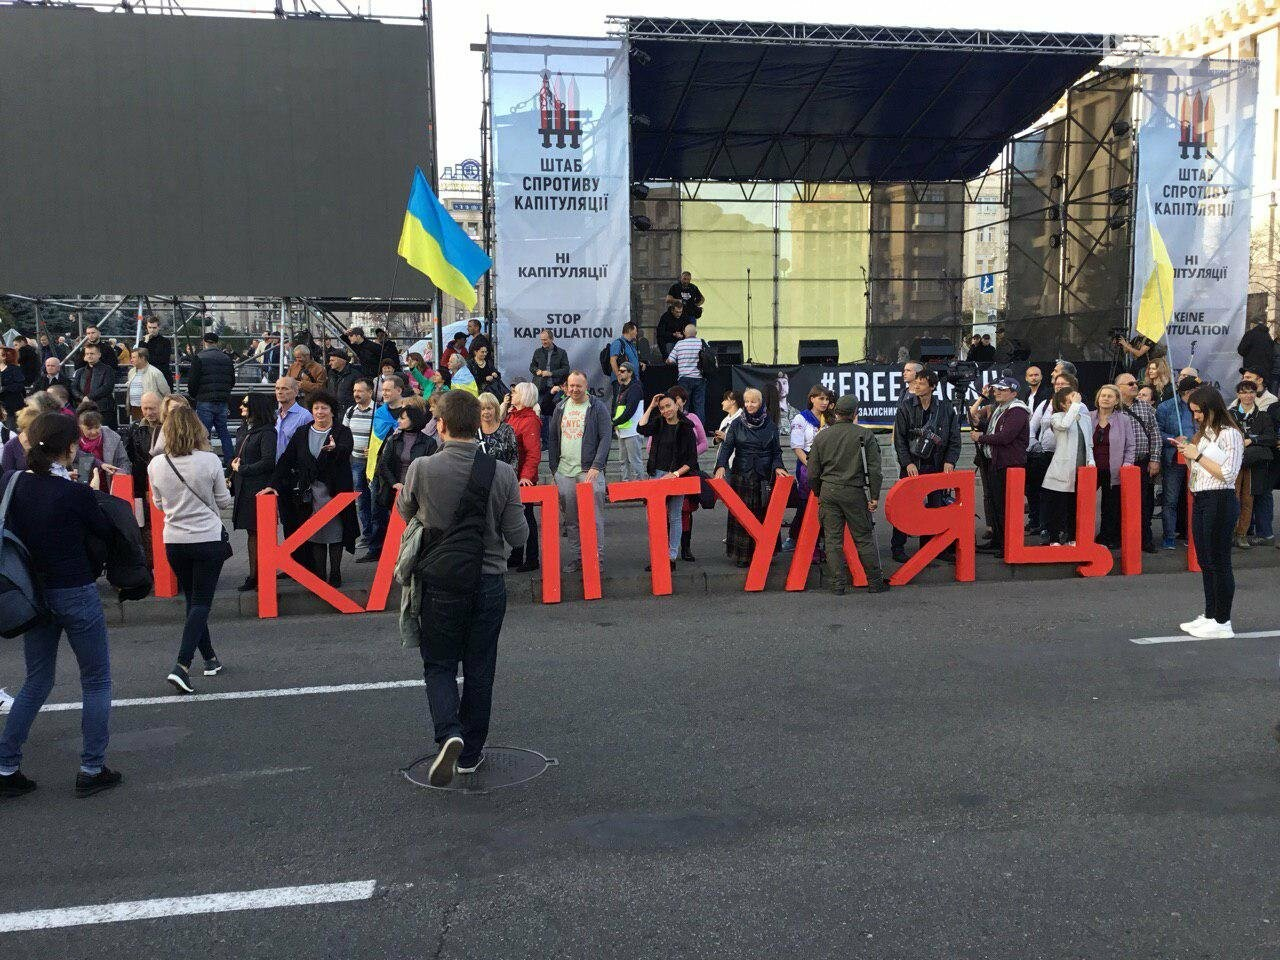 Криворожане поддержали Марш сопротивления капитуляции в Киеве, - ФОТО, ВИДЕО, ОБНОВЛЕНО, фото-24